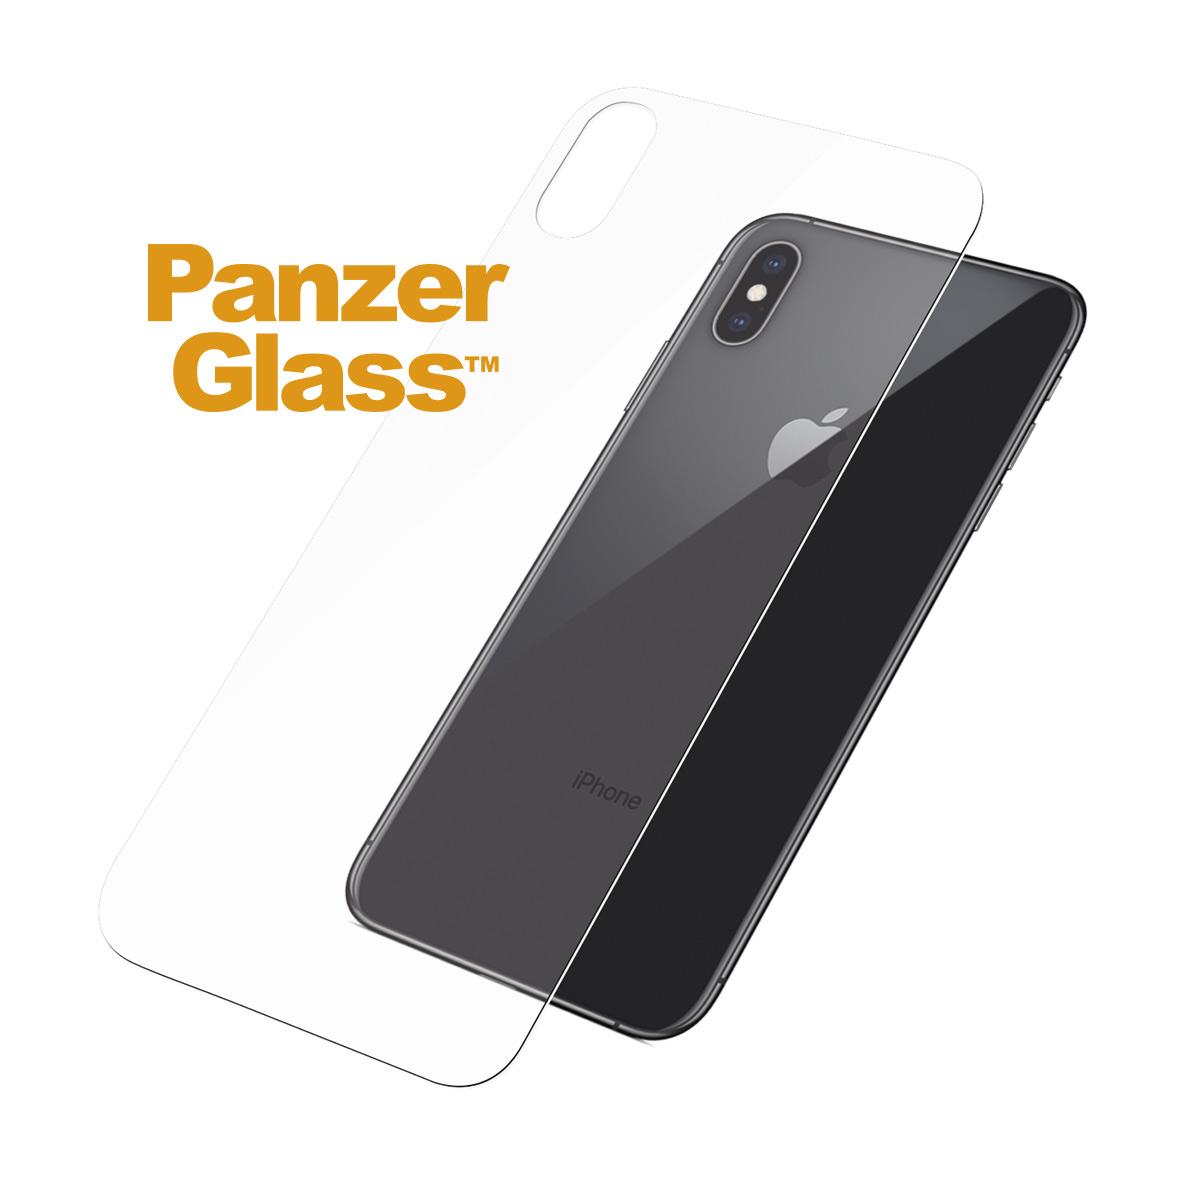 36ae05f371e Tagakülje kaitseklaas Apple iPhone Xs Max, PanzerGlass